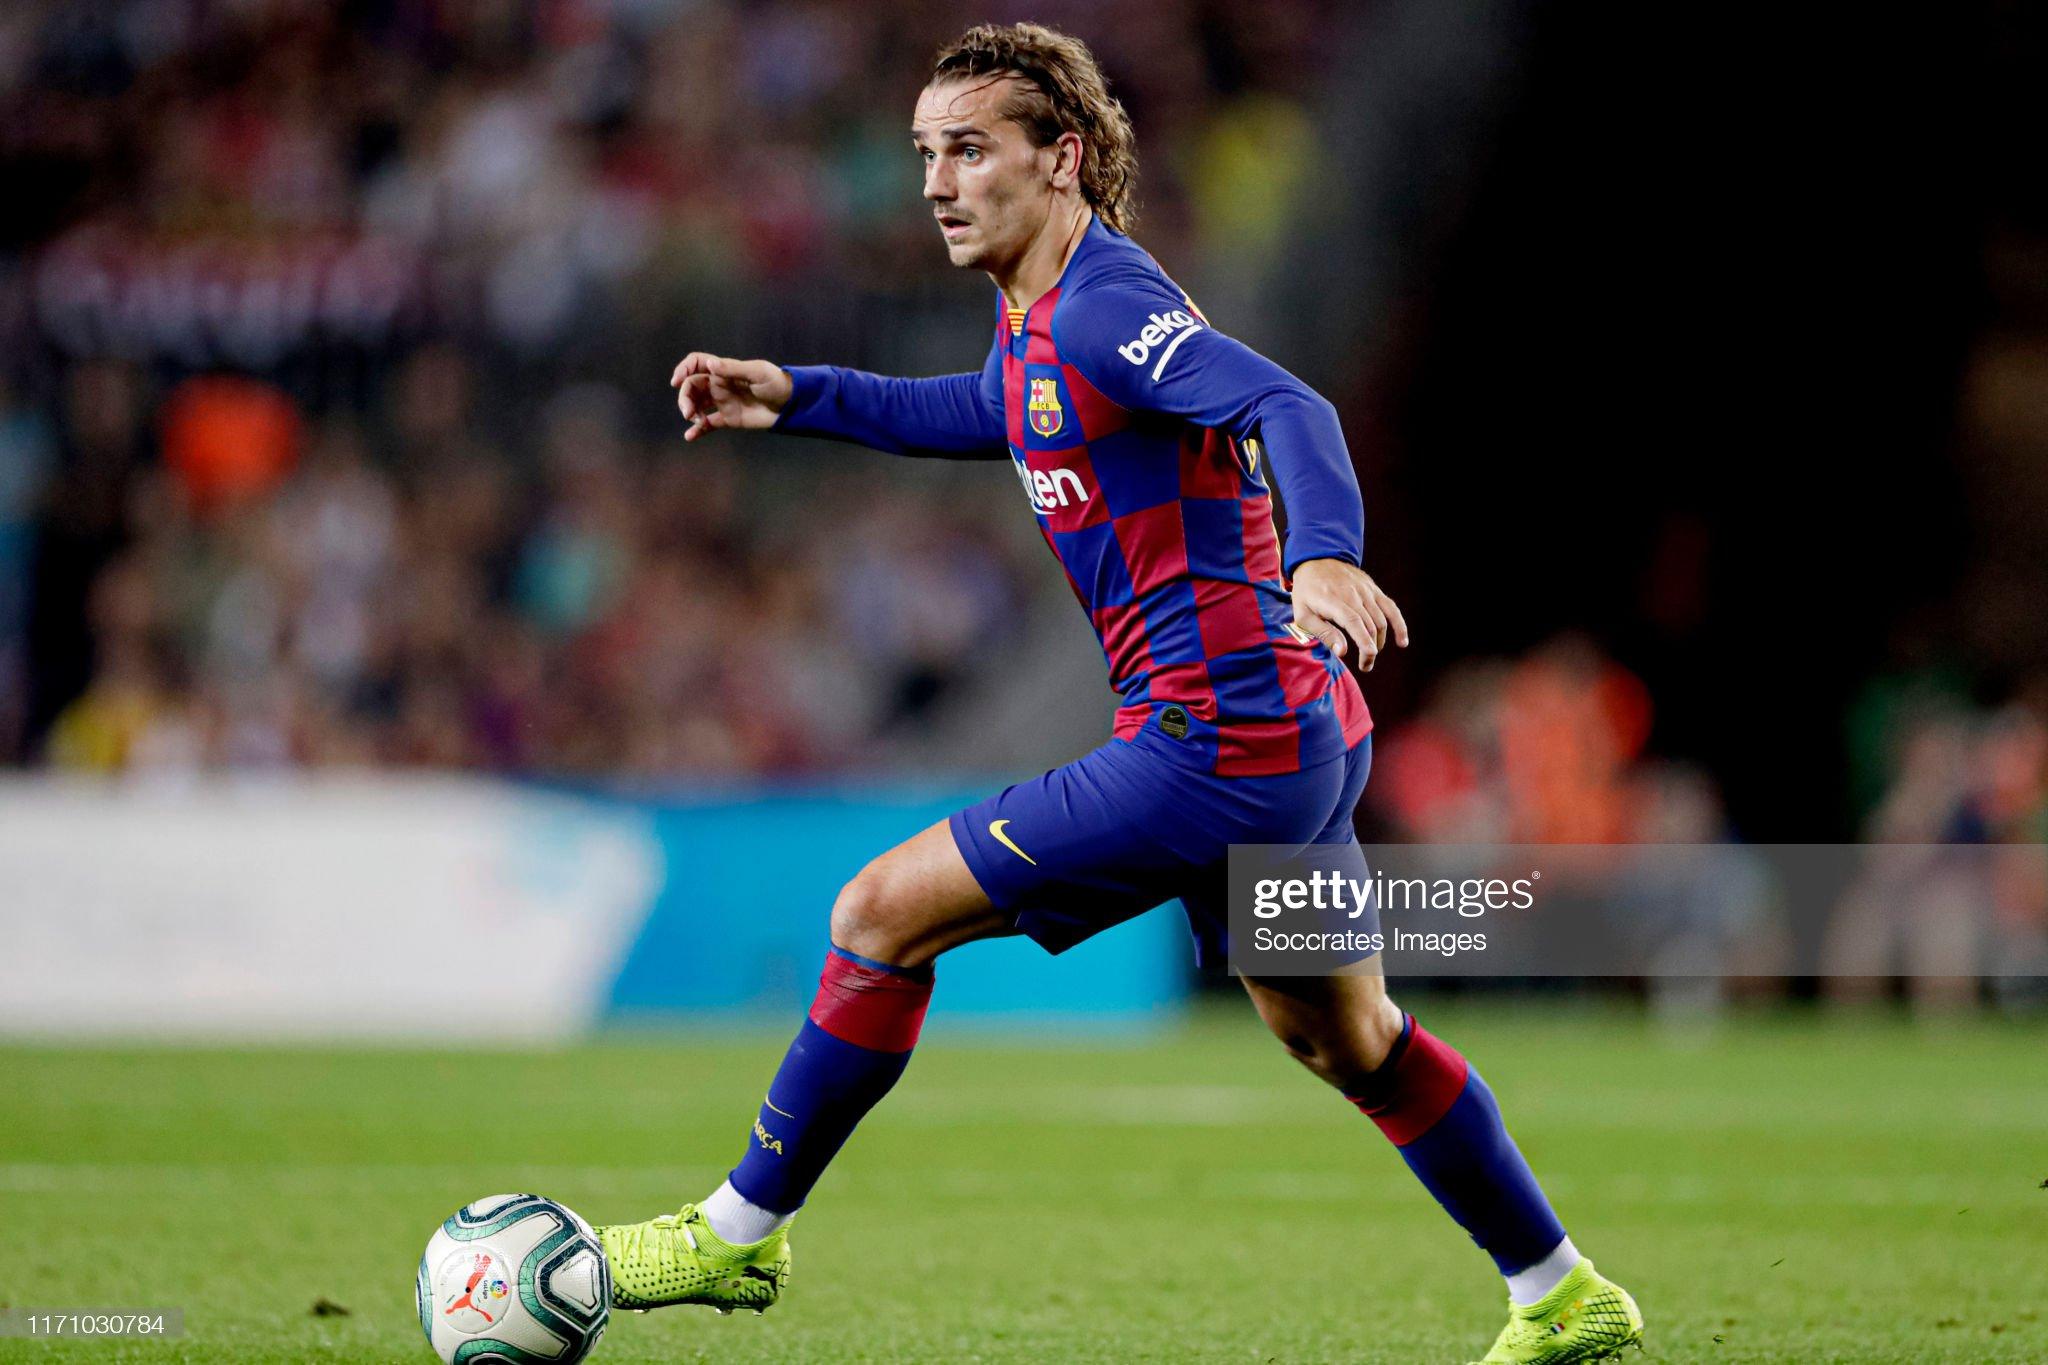 صور مباراة : برشلونة - فياريال 2-1 ( 24-09-2019 )  Antoine-griezmann-of-fc-barcelona-during-the-la-liga-santander-match-picture-id1171030784?s=2048x2048